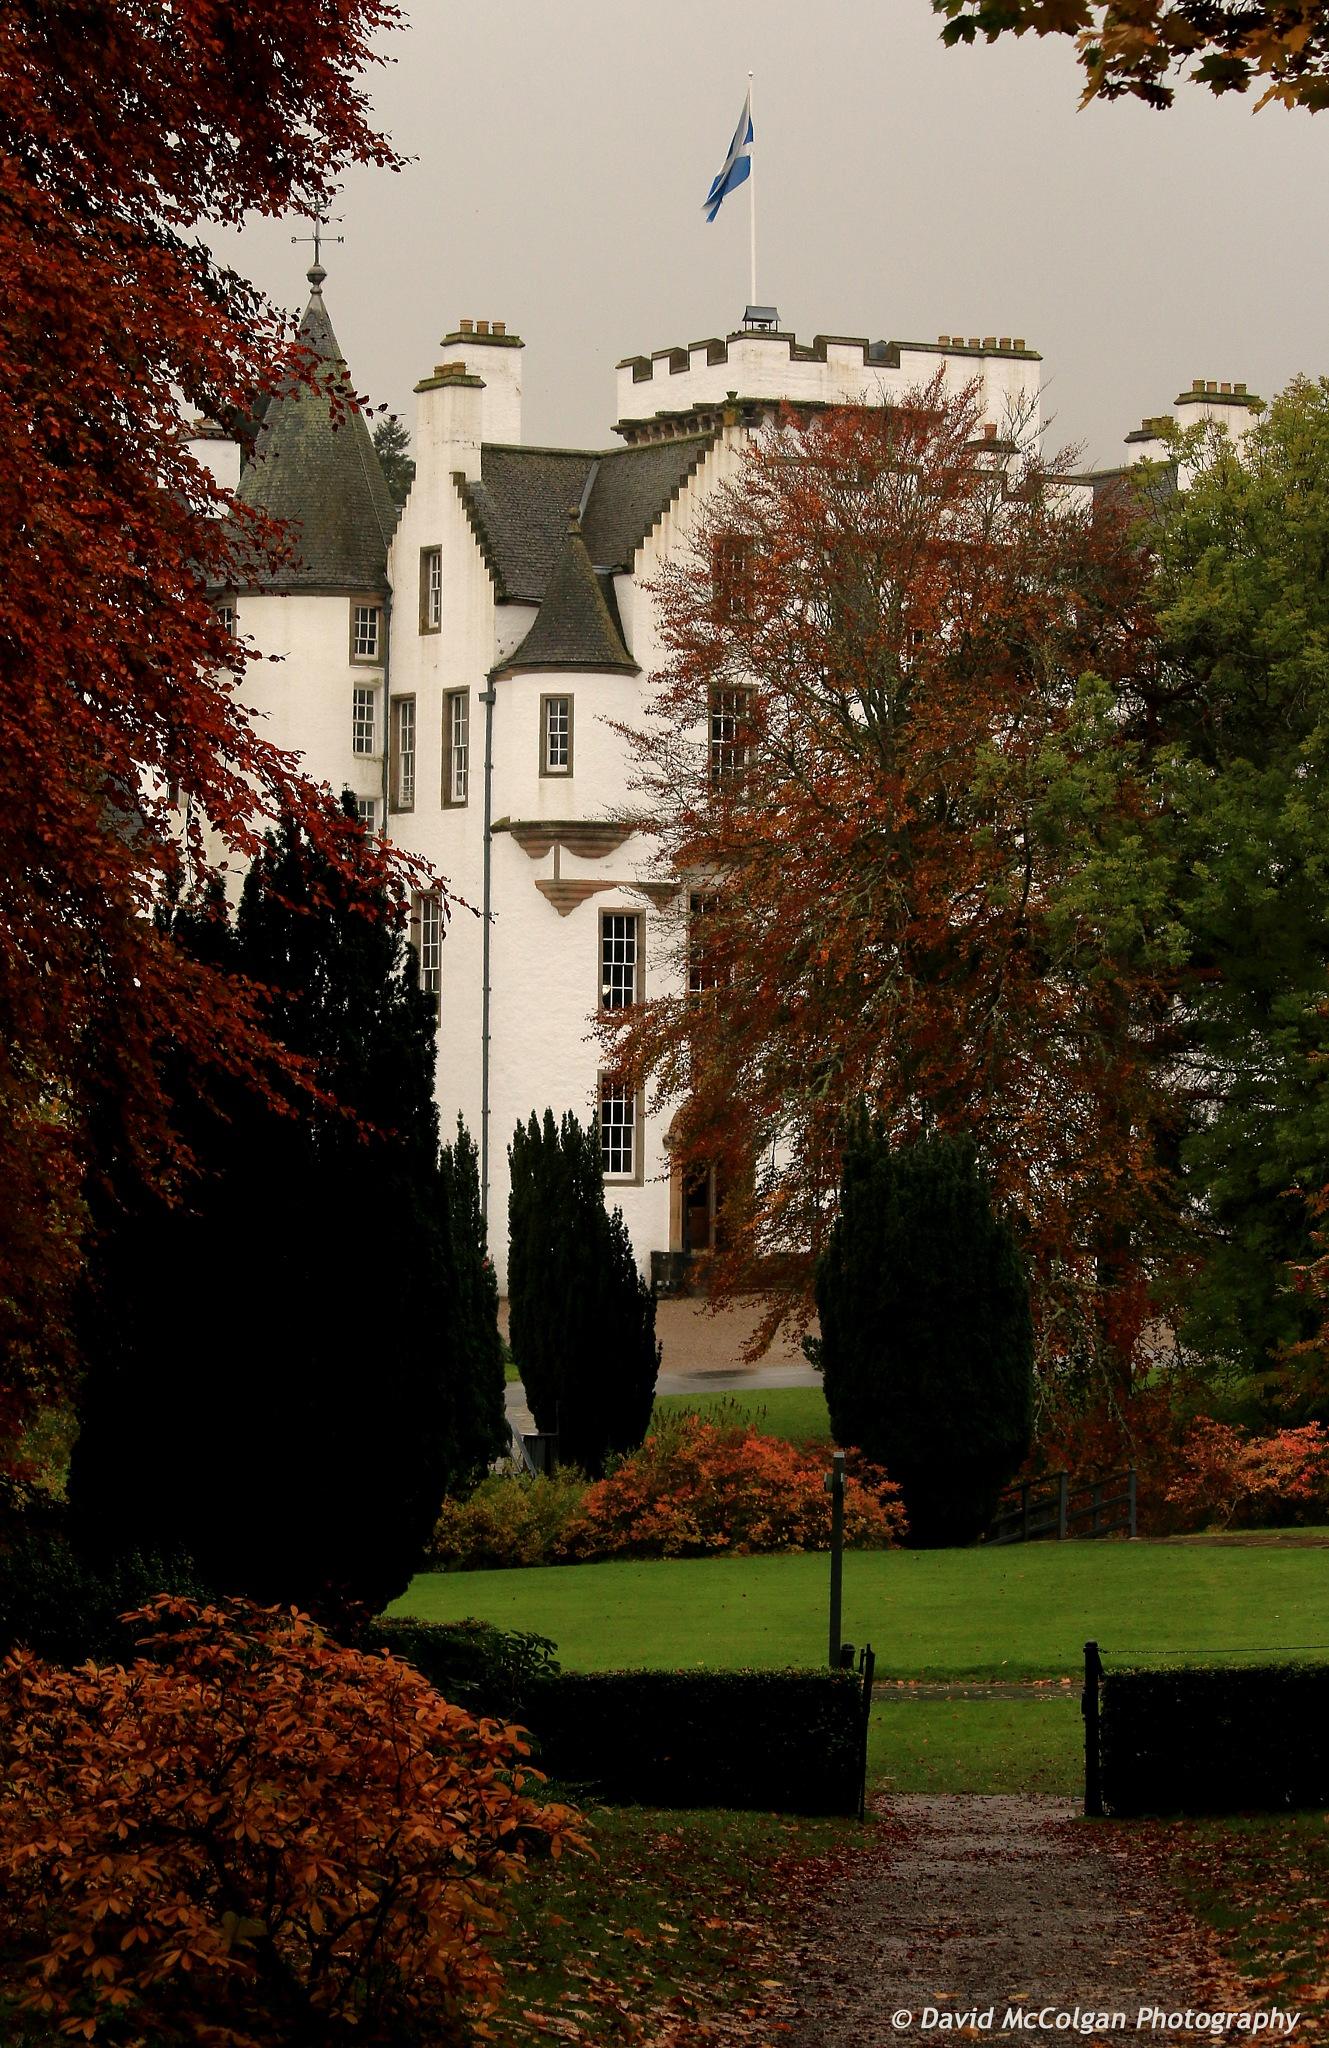 Blair Castle by David McColgan Photography